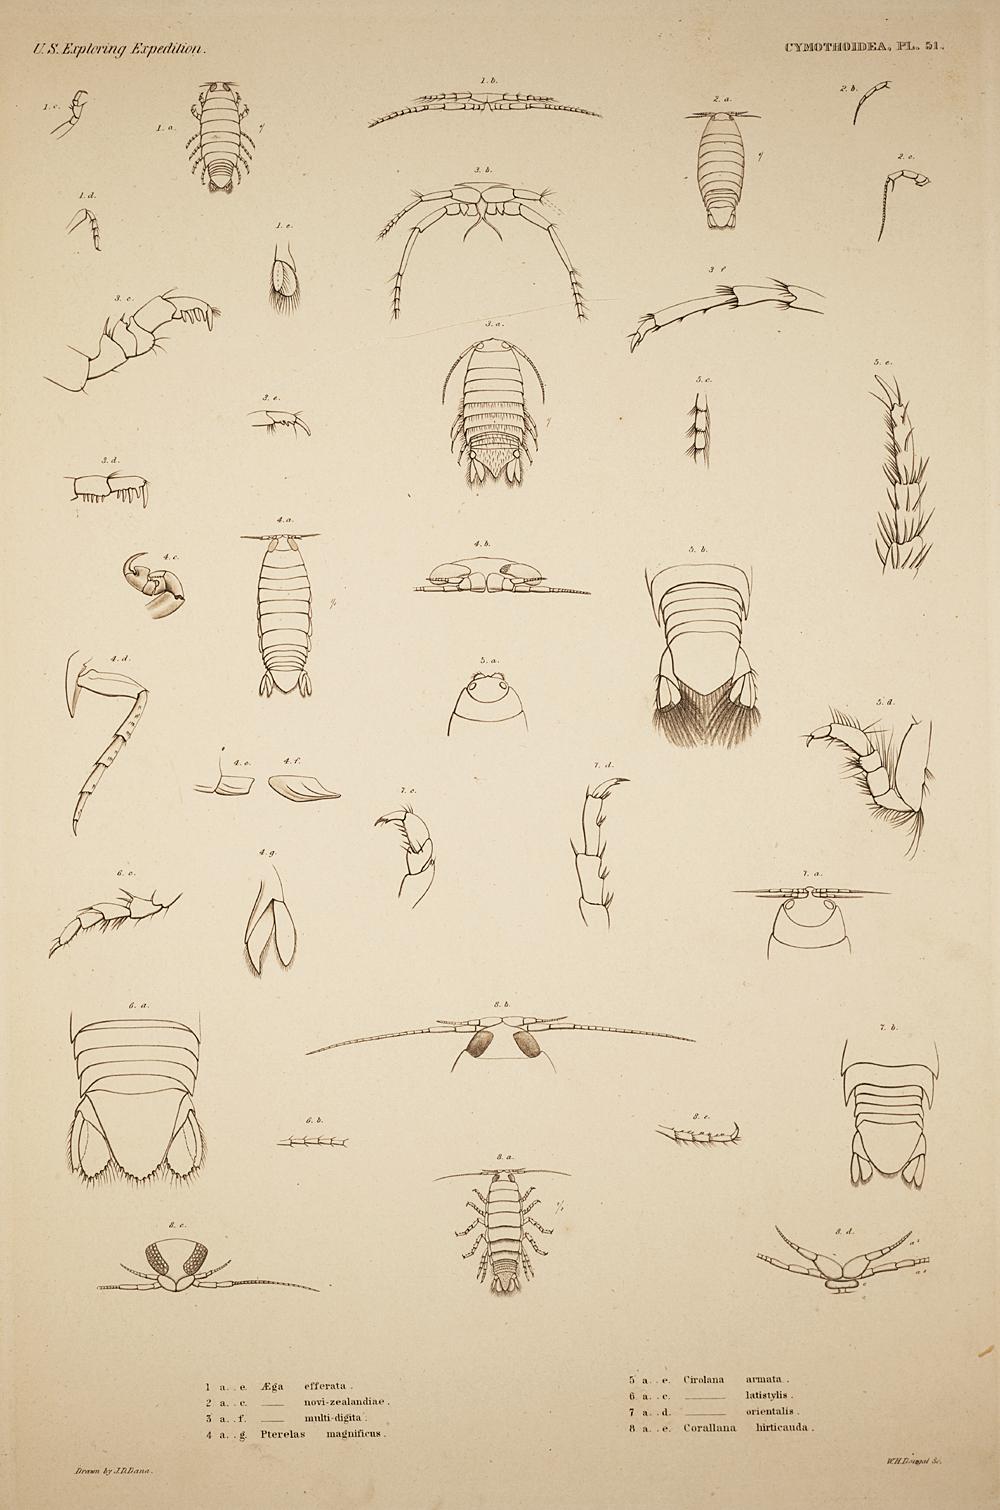 Cymothoidea. Pl. 51,  Image number:SIL19-21-135b